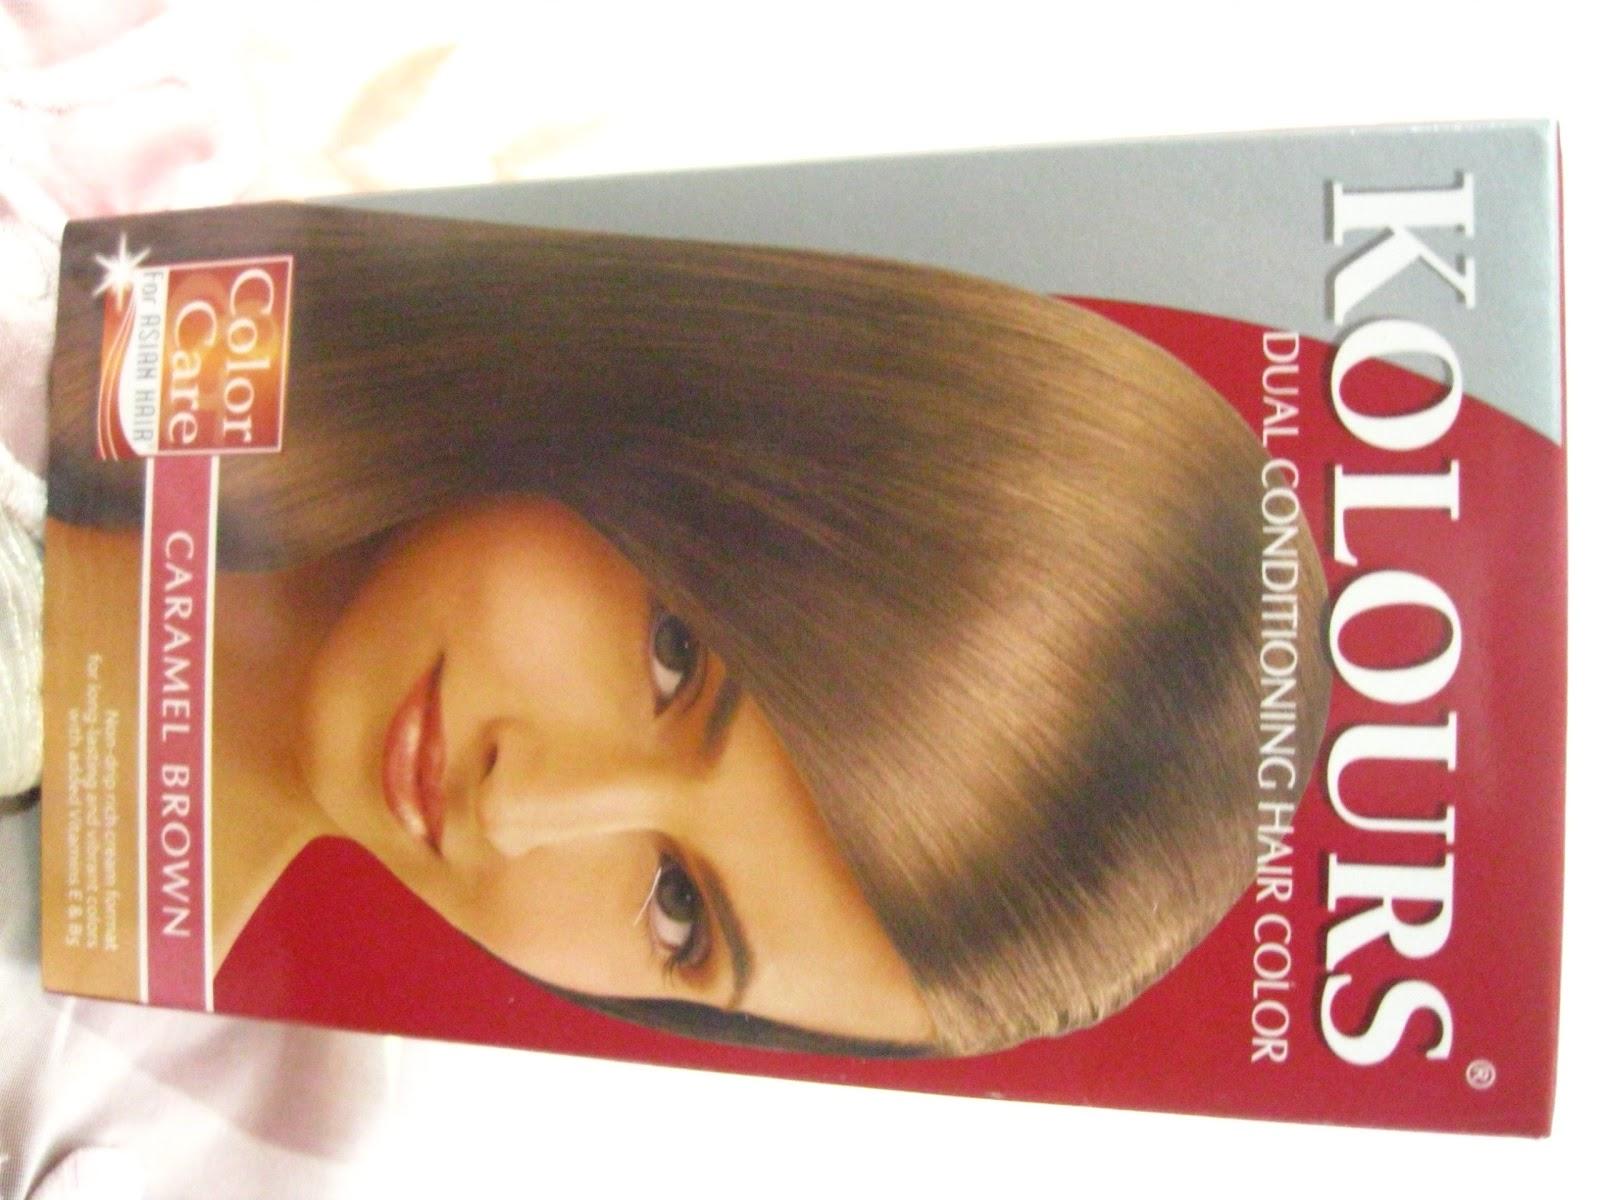 kolours hair color chart:  hey girls its me ina d kolours hair dye